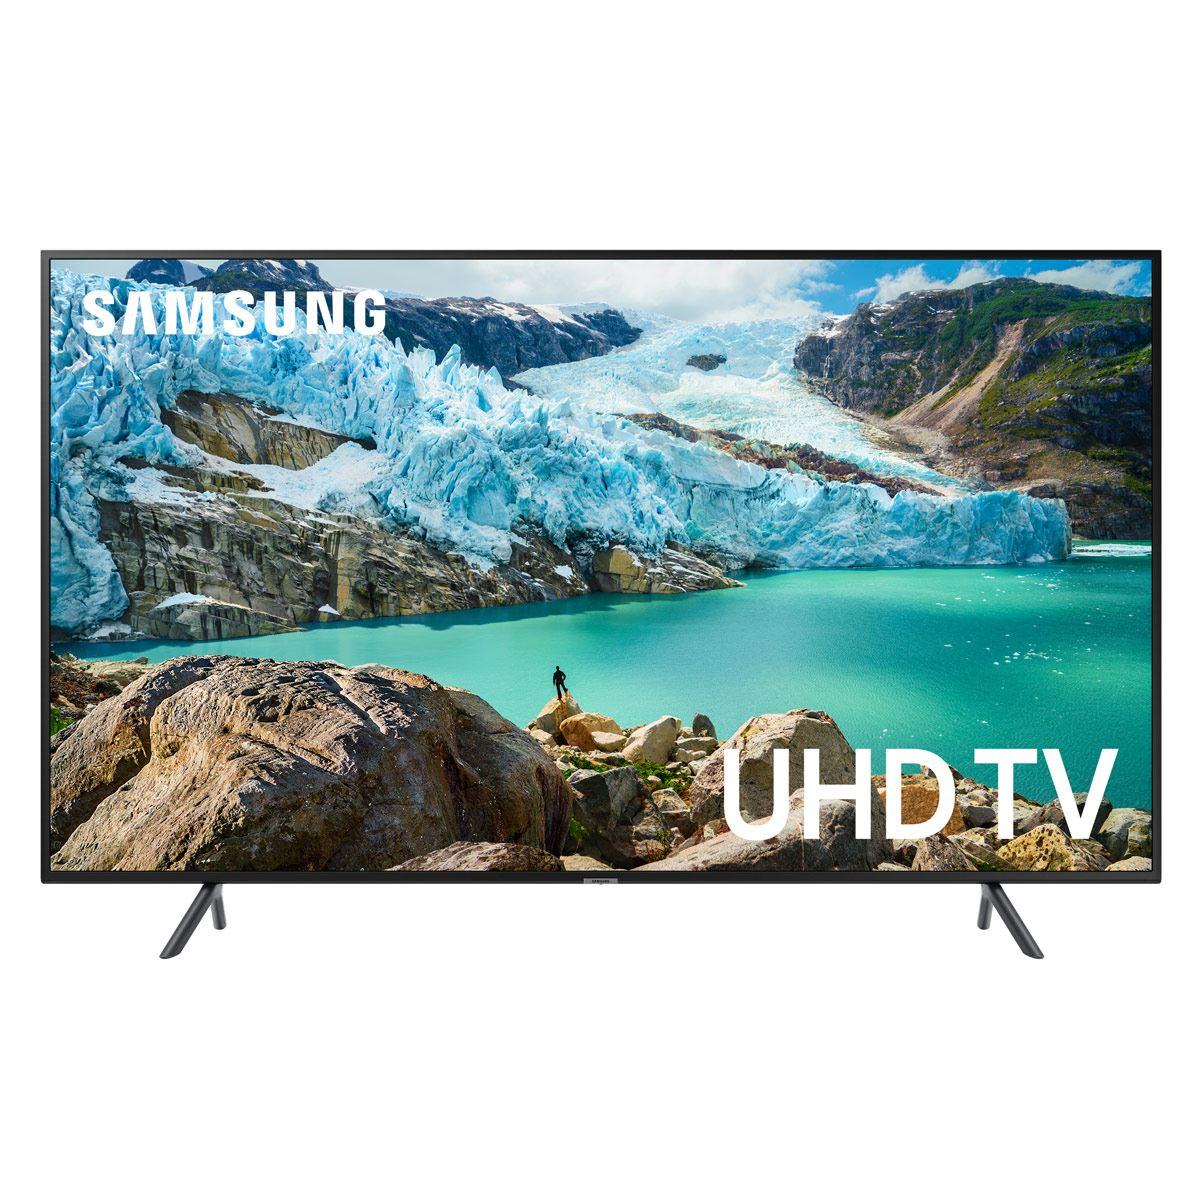 "Sanborns: Pantalla Samsung 65"" 4K UHD Smart TV Modelo 2019 RU7100"